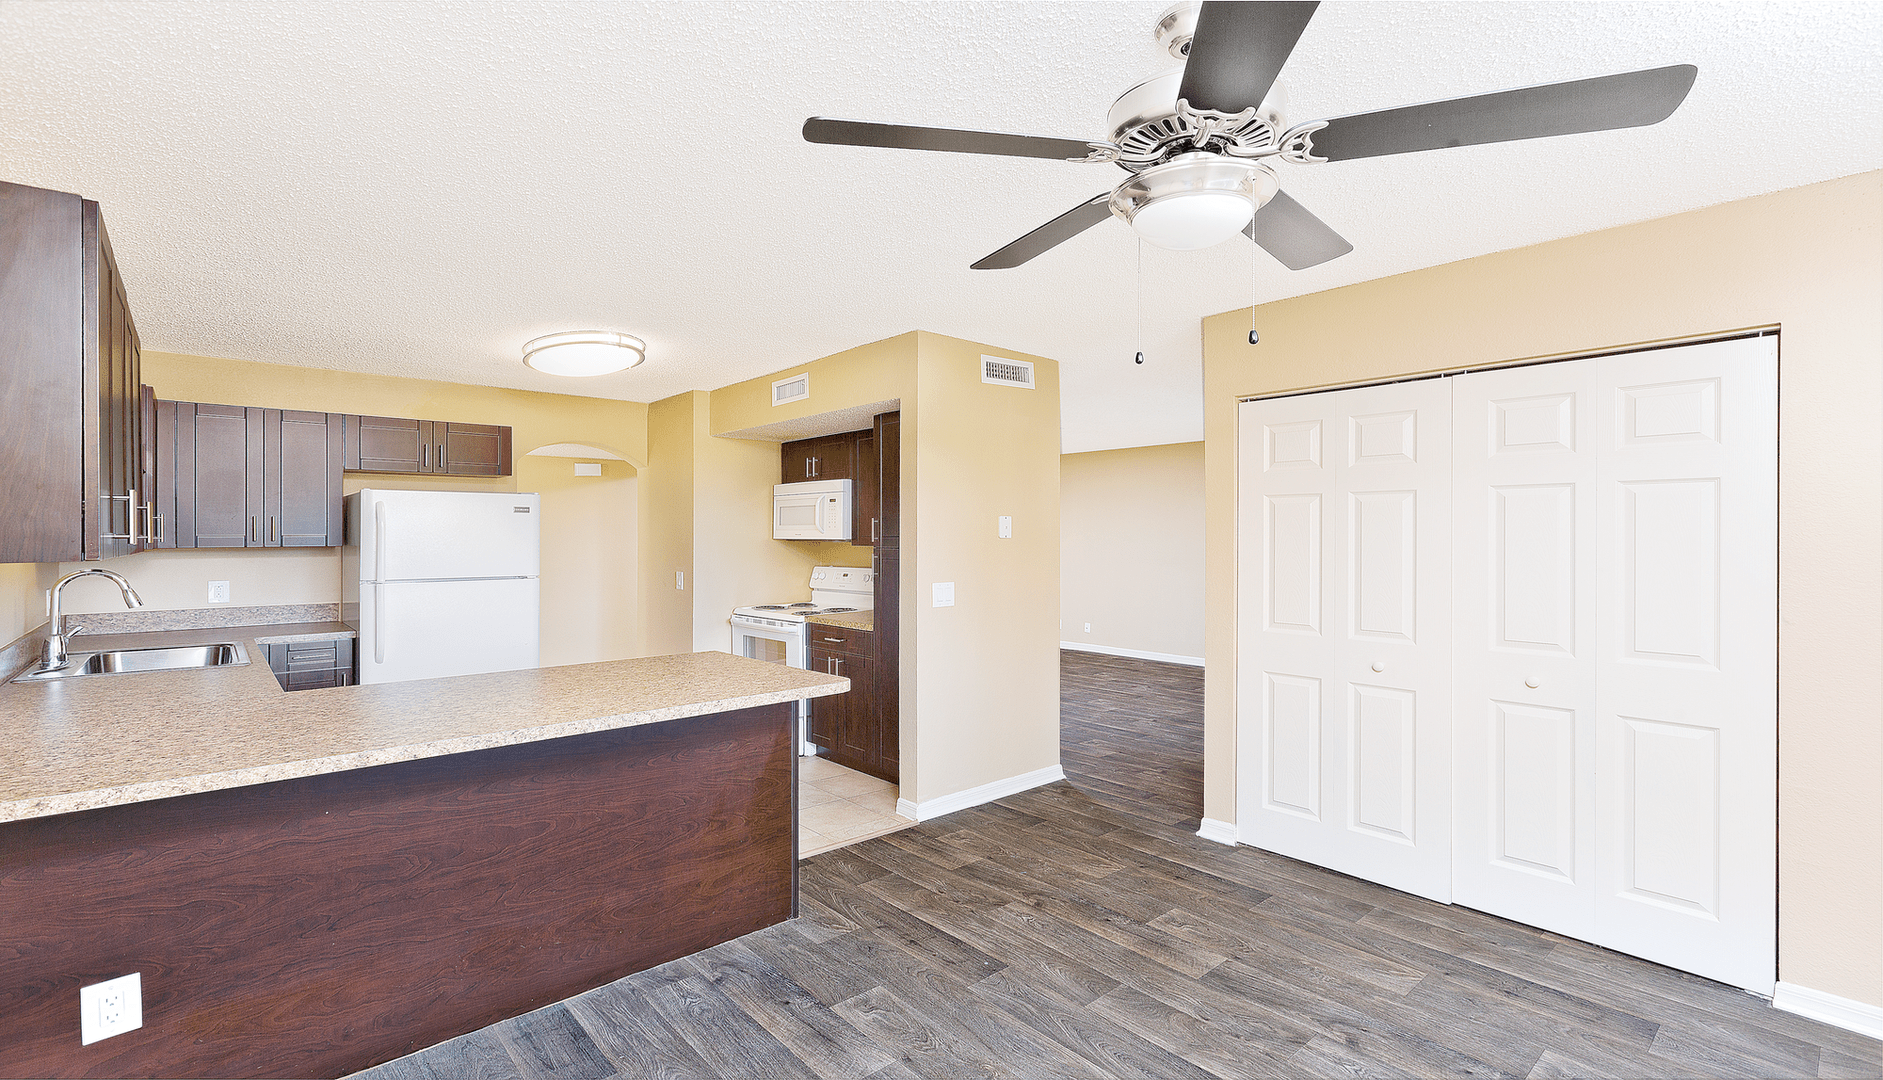 Apartments For Rent In Boynton Beach Fl Whalers Cove Home